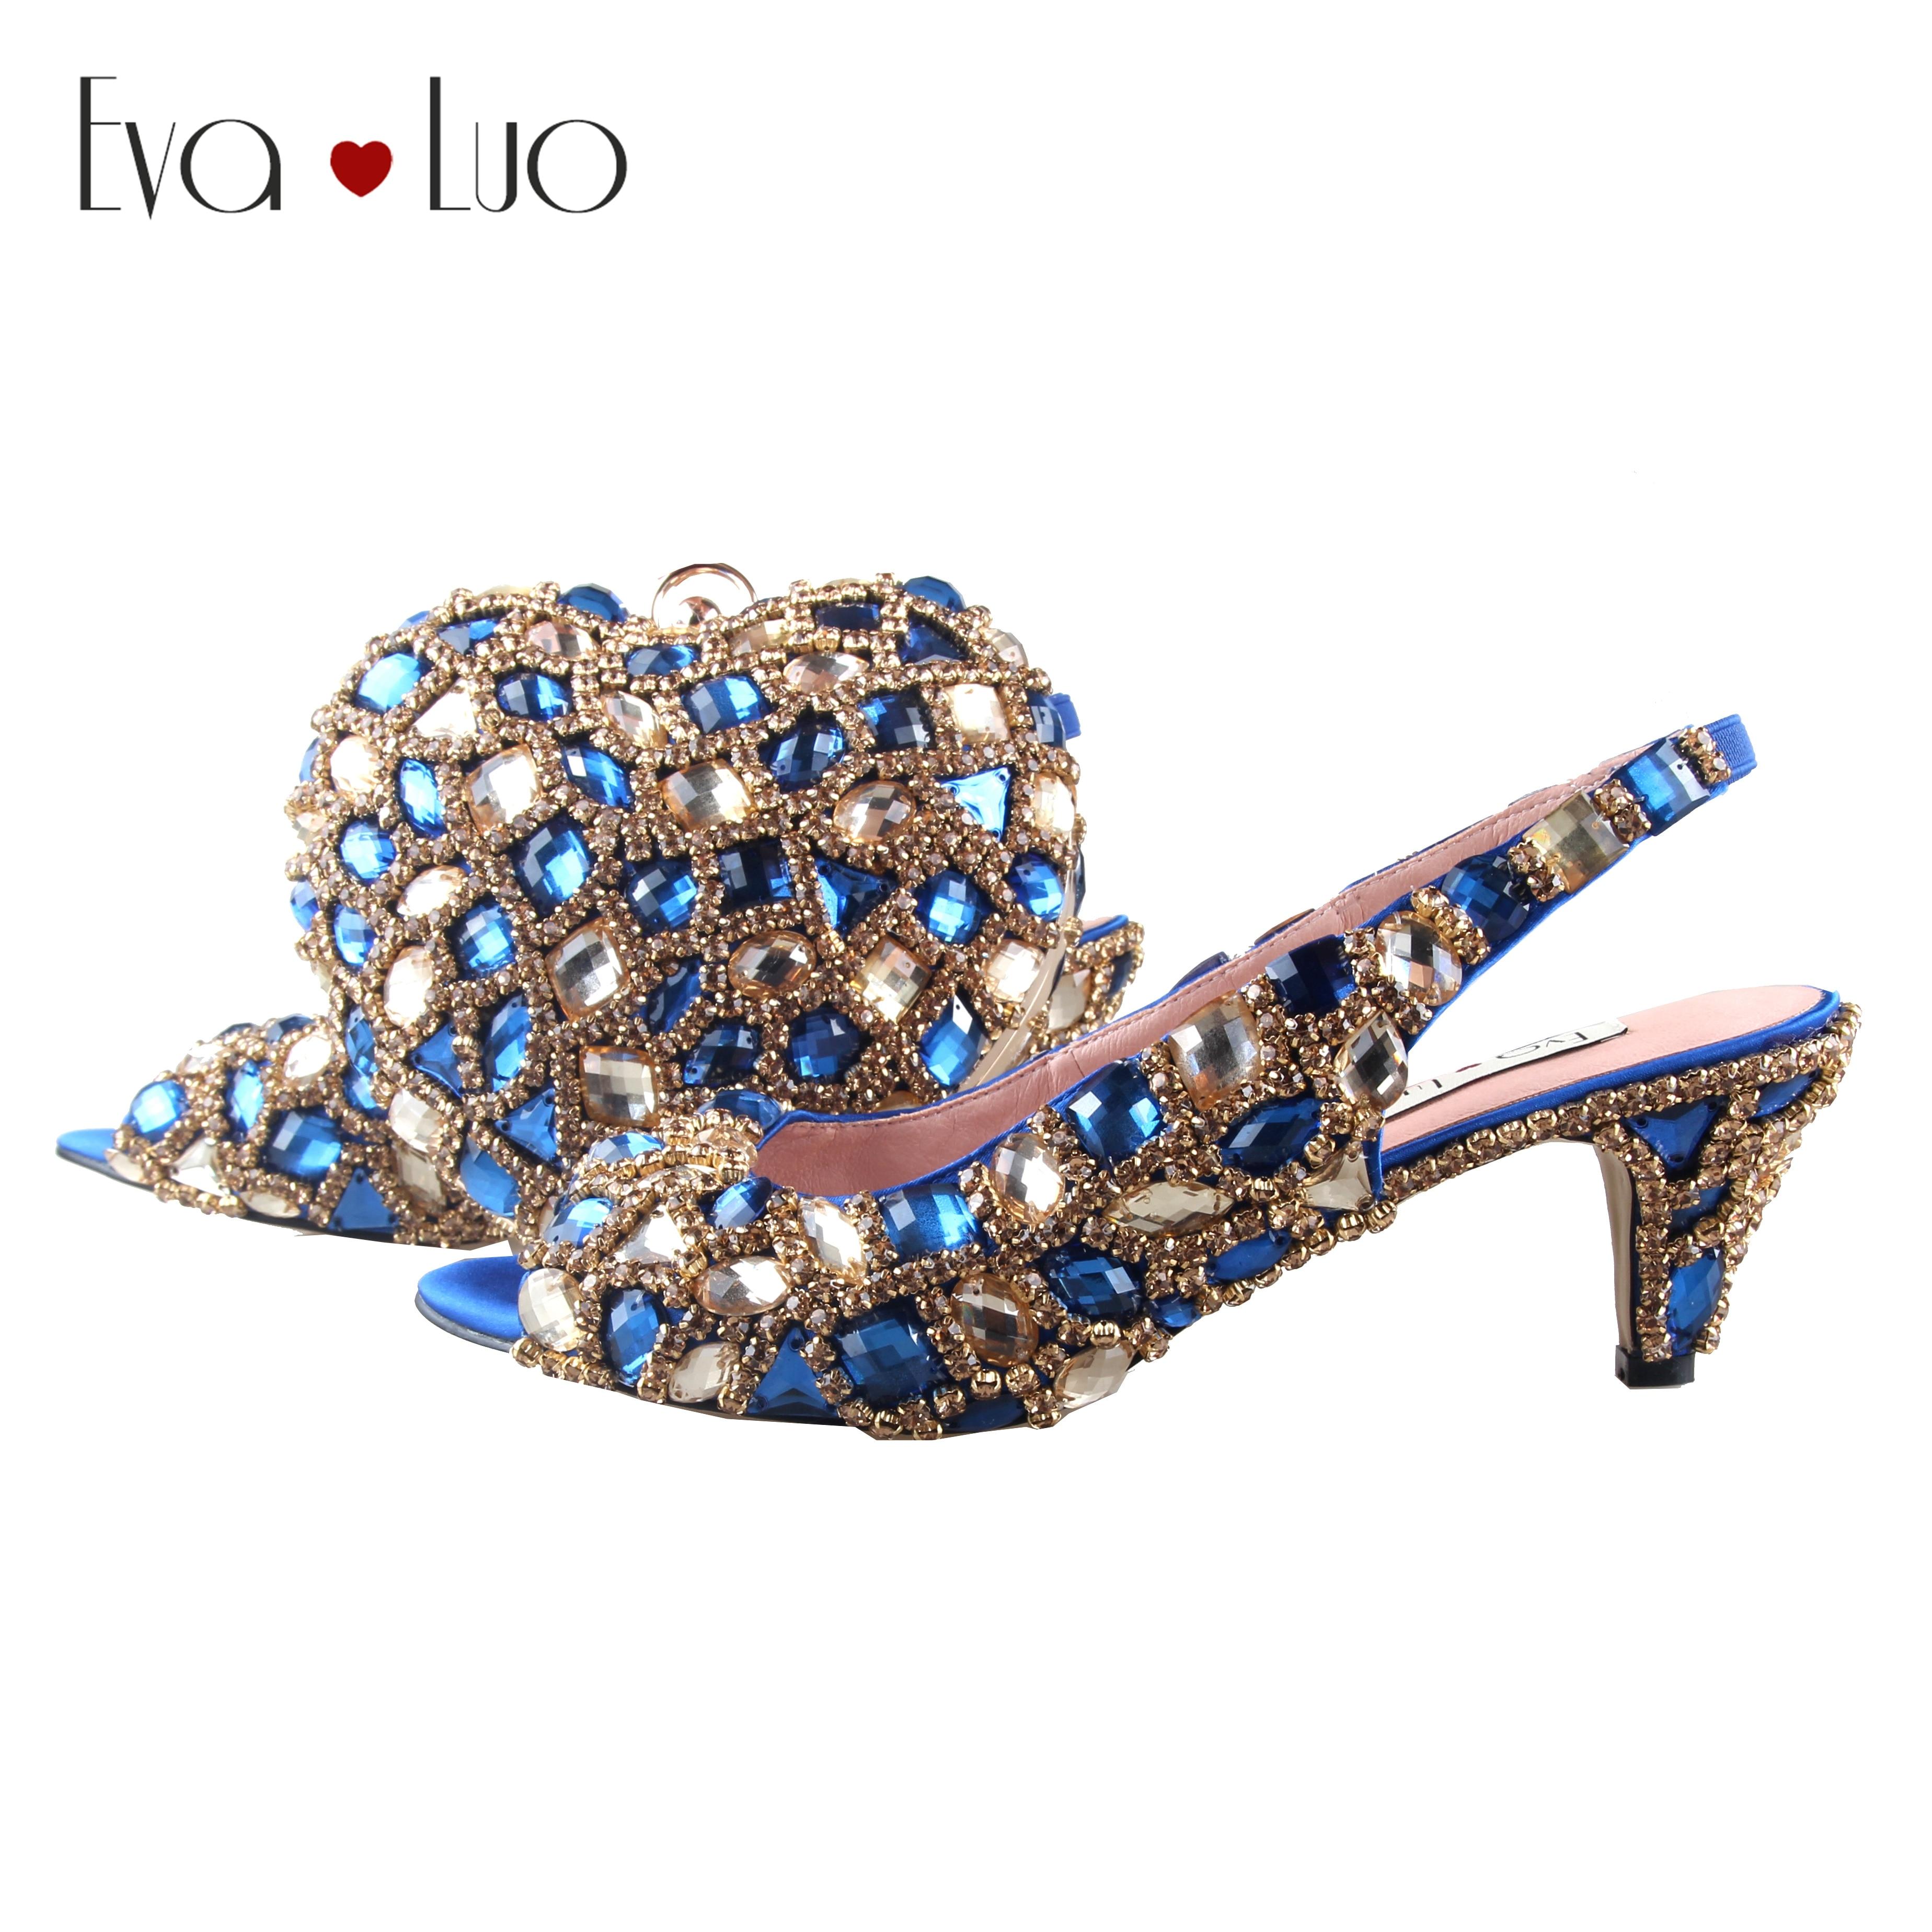 BS1037 Custom Made Gold Royal Blue Rhinestones Shoes With Matching Bag Low Heel Slingbacks Women Shoes